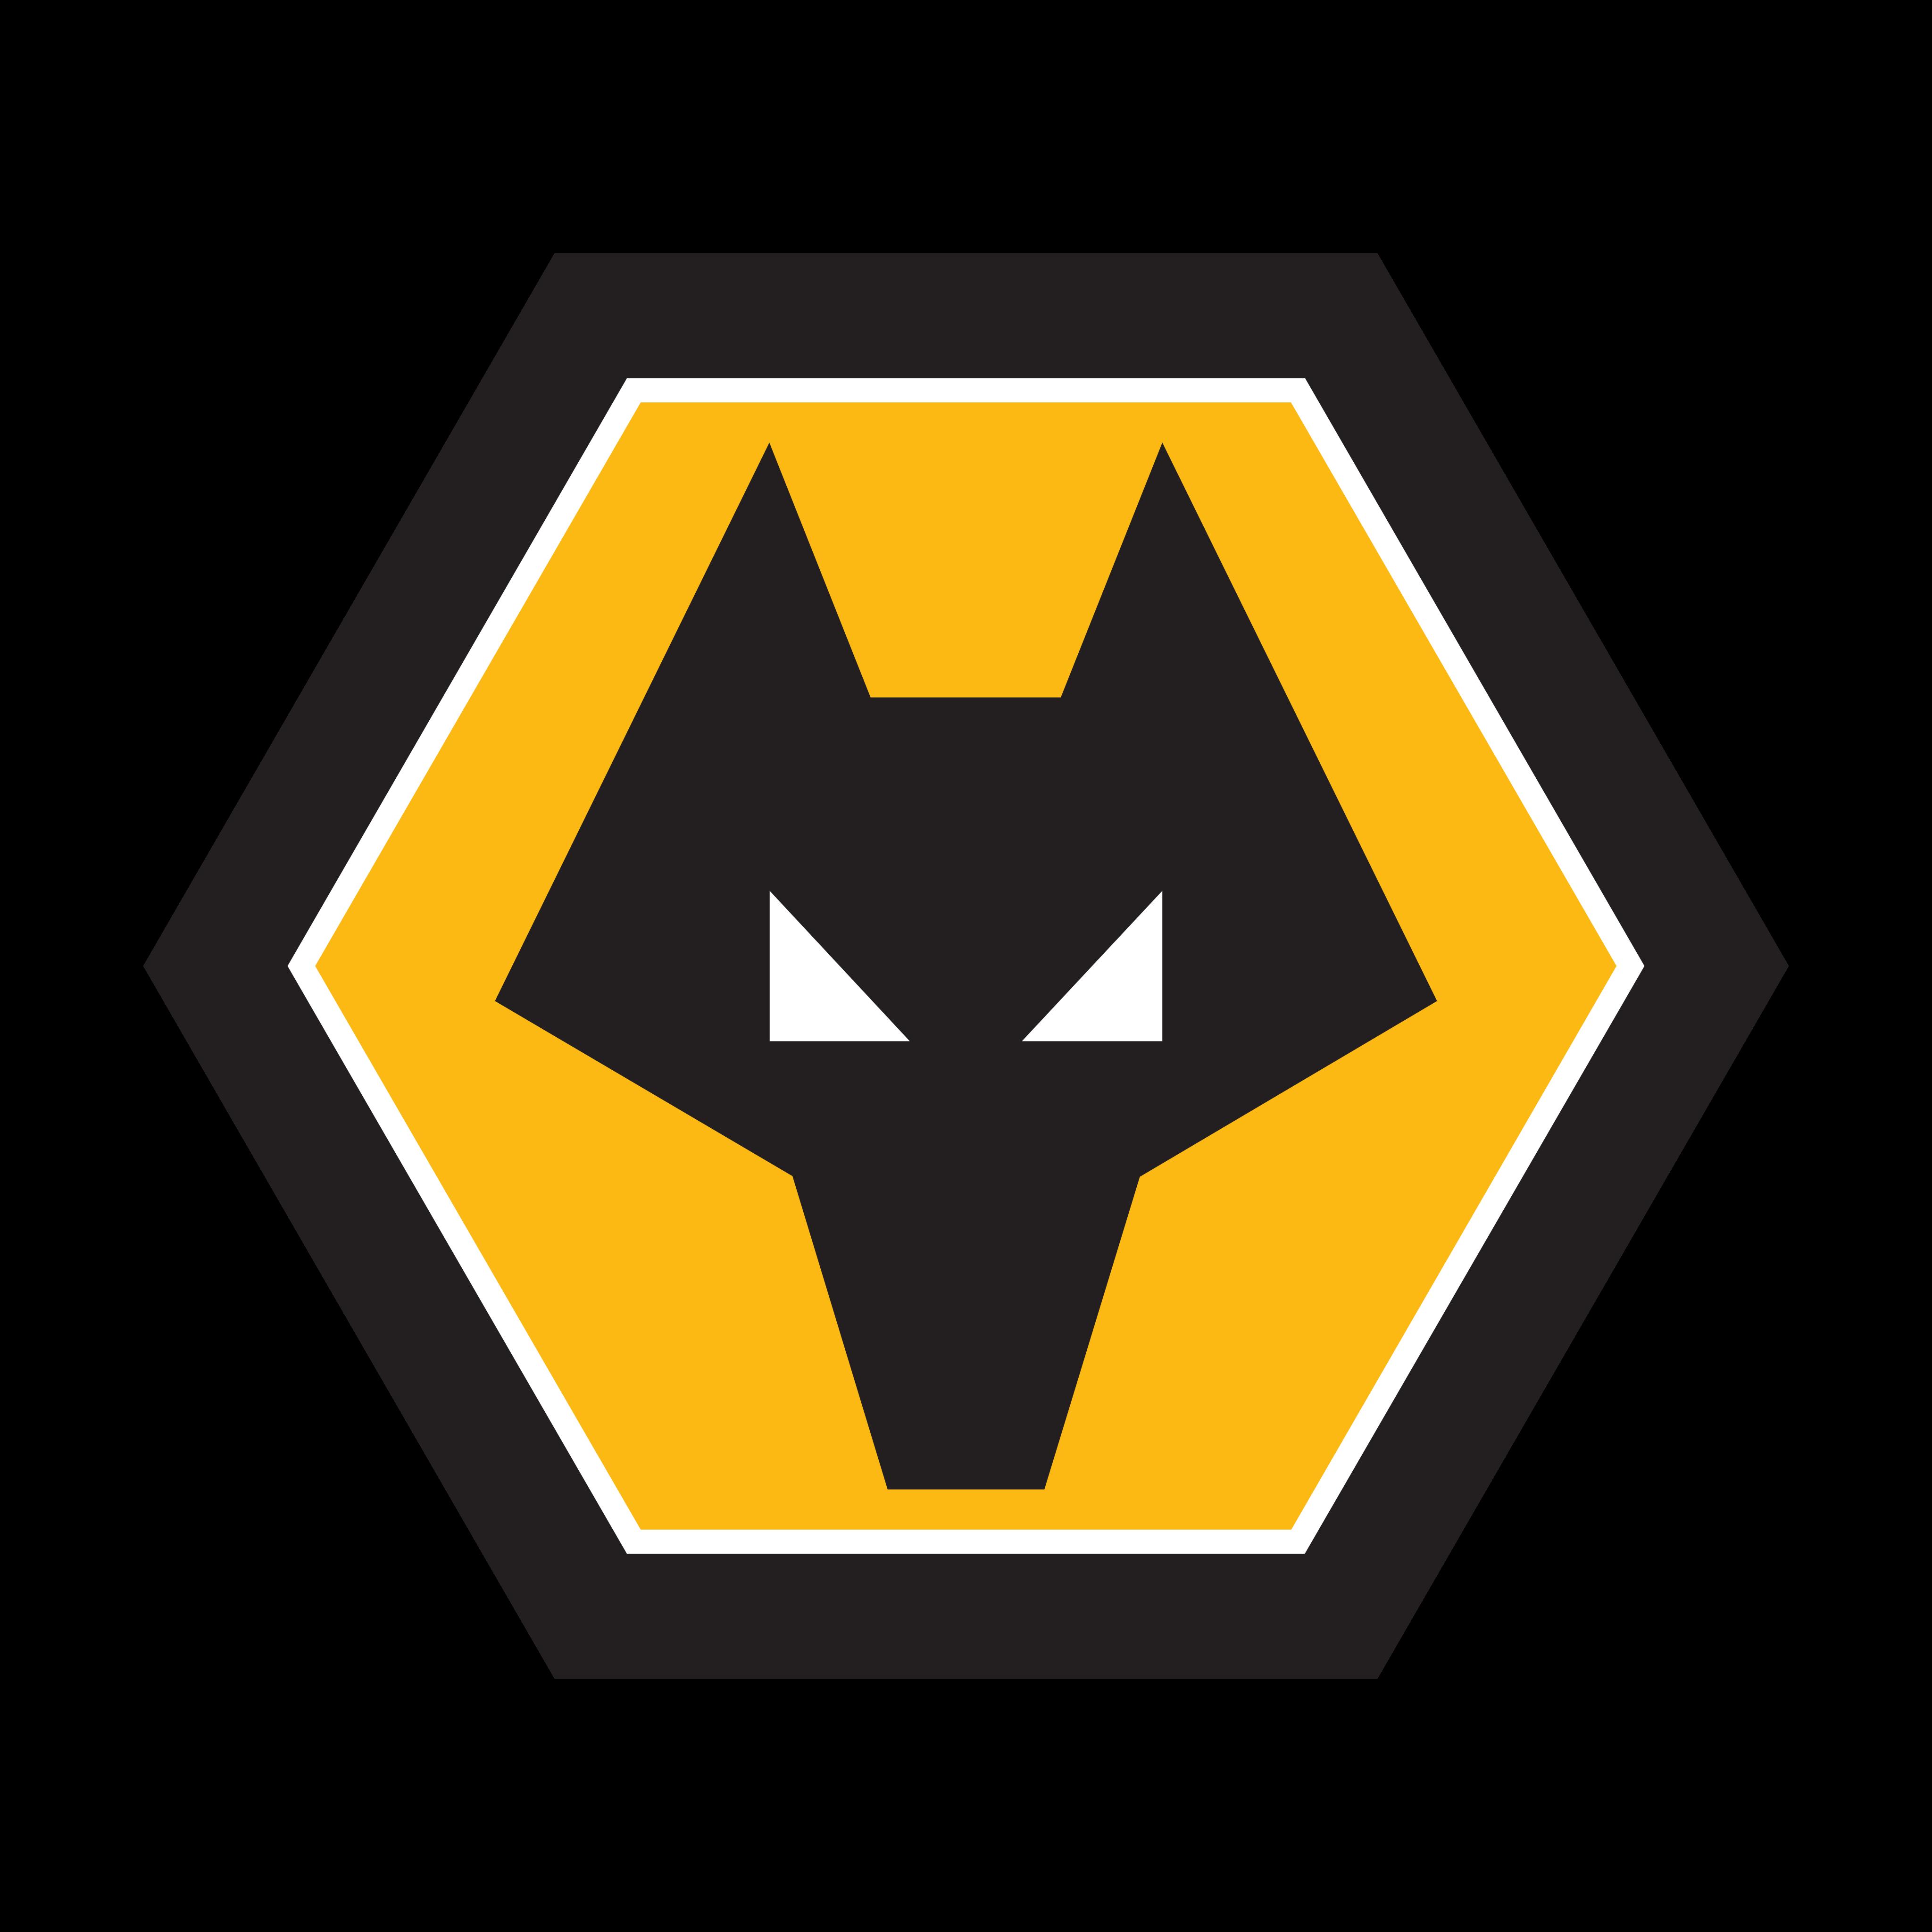 wolverhampton logo escudo 0 - Wolverhampton FC Logo